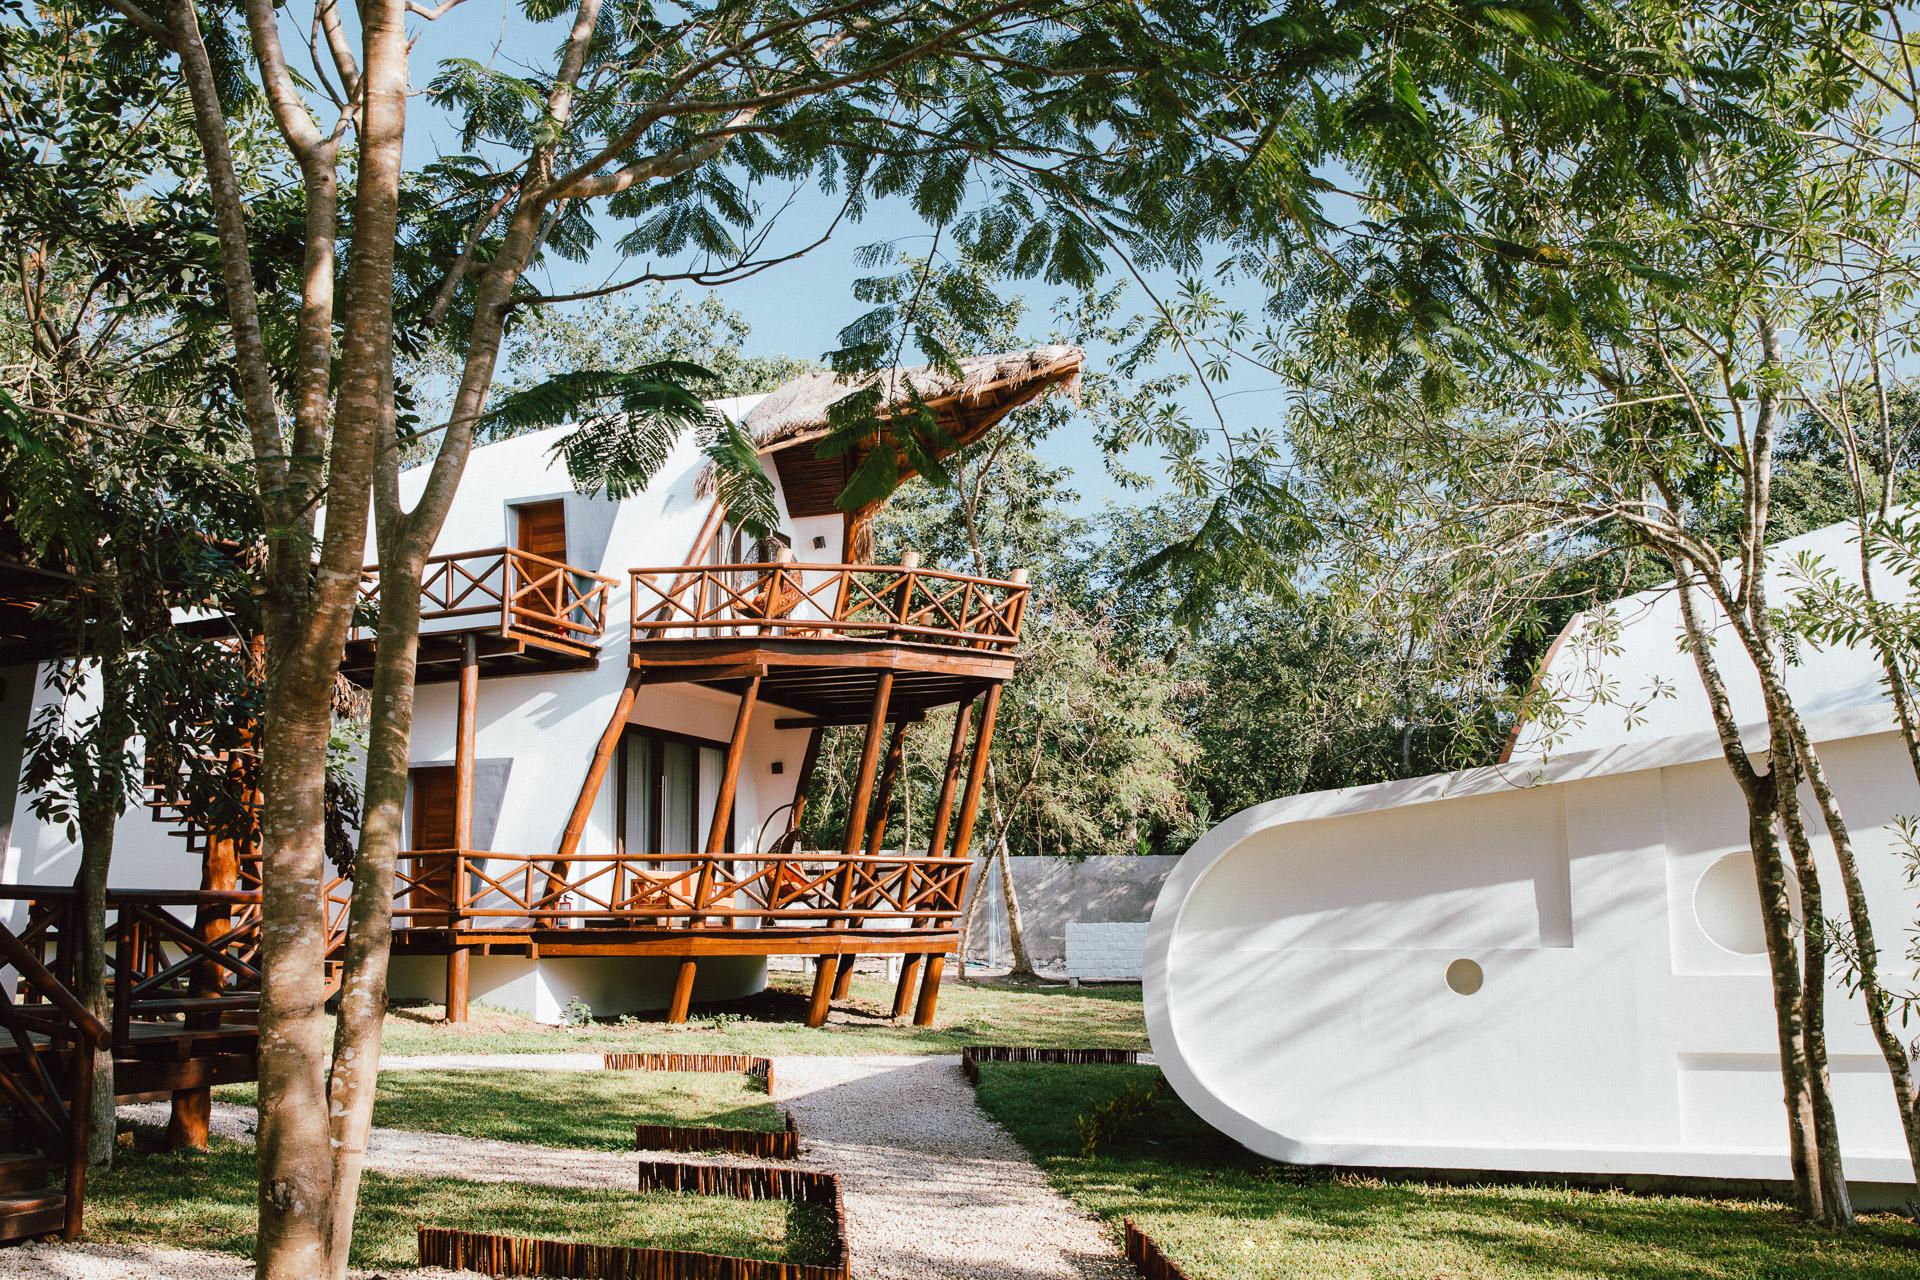 mexico-luxury-hotel-photographer-riviera-maya-mia-bacalar-9.jpg